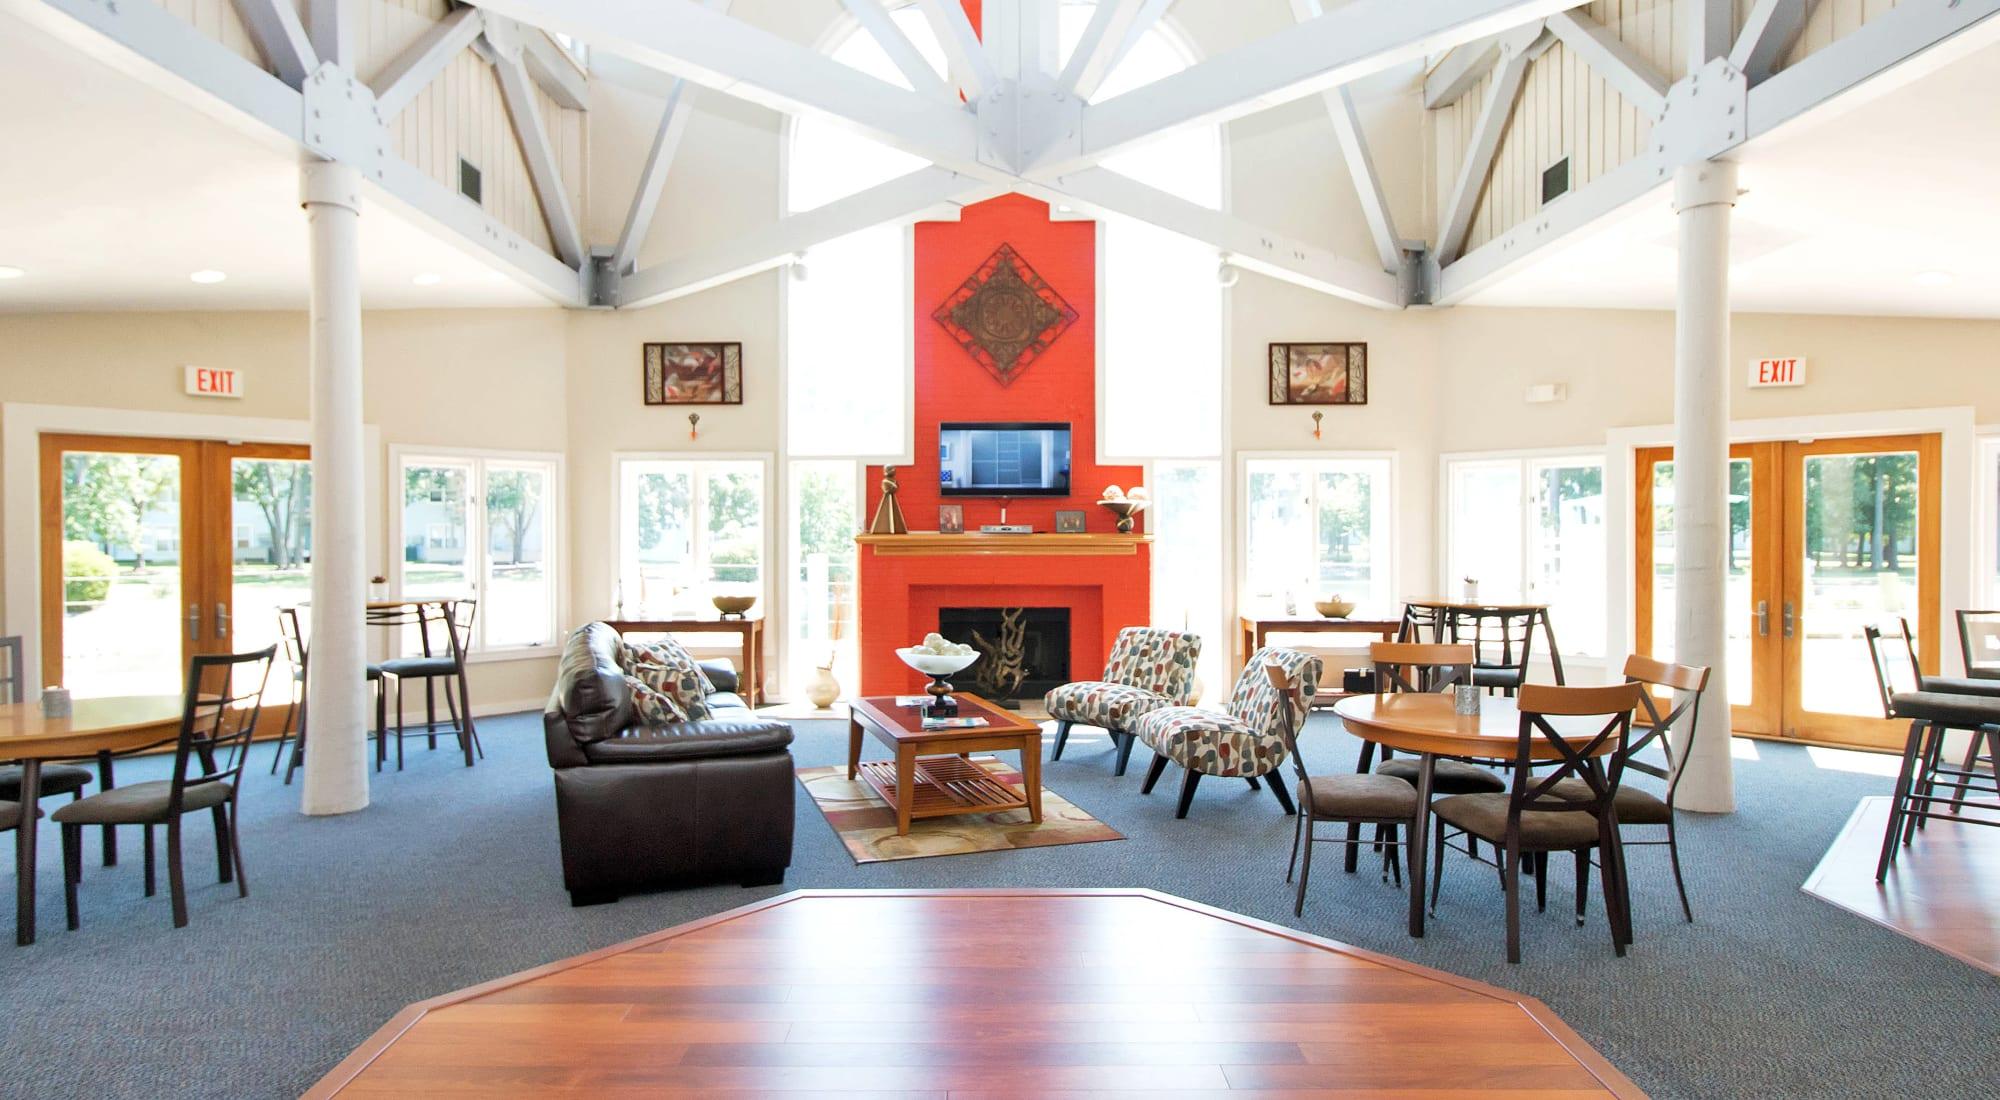 Schedule your tour of Runaway Bay Apartments in Virginia Beach, Virginia